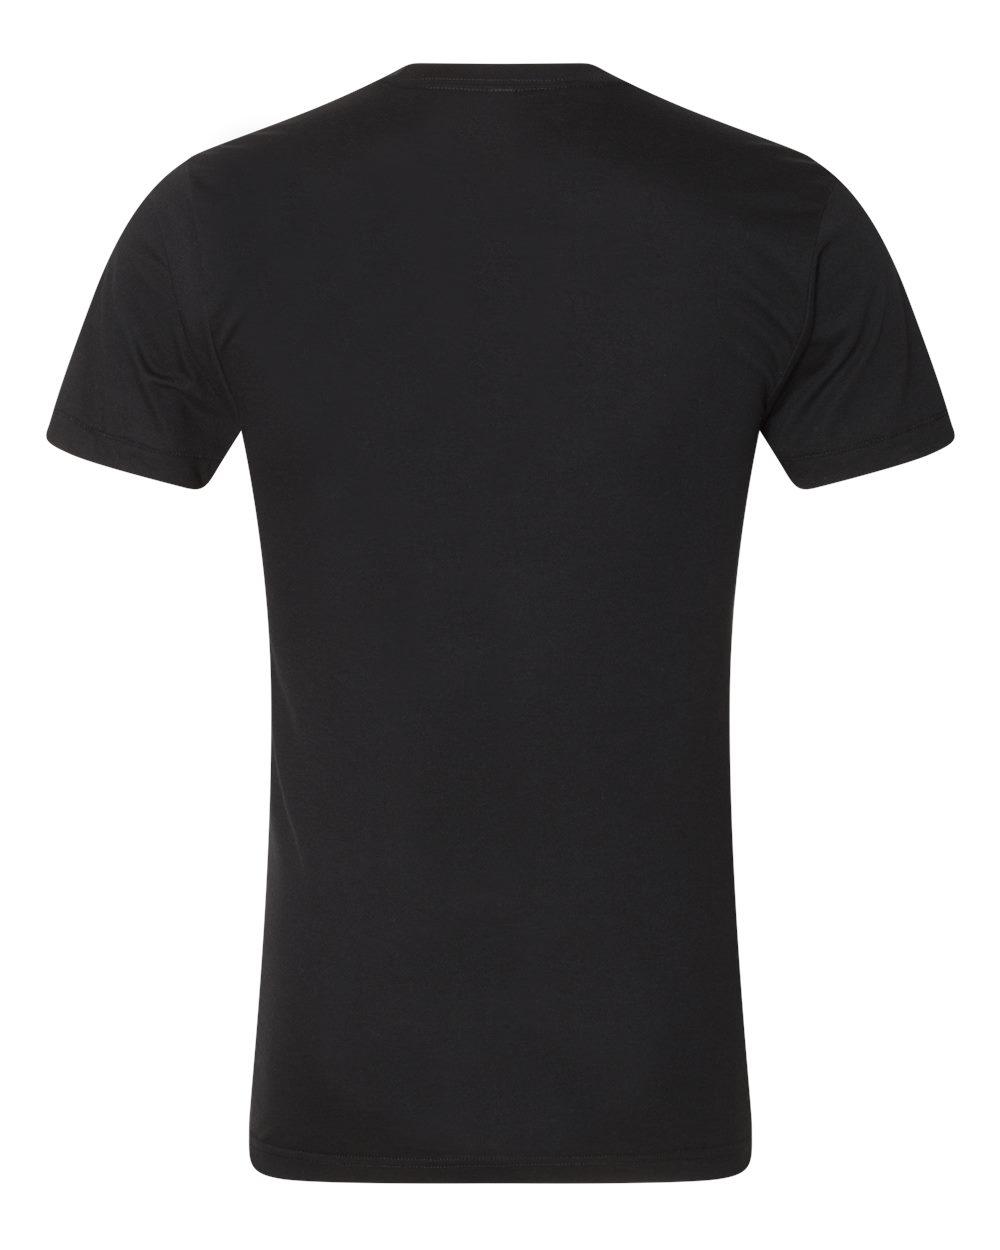 American-Apparel-Mens-Slim-Fit-50-50-Cotton-T-Shirt-Tee-BB401W-up-to-2XL thumbnail 10